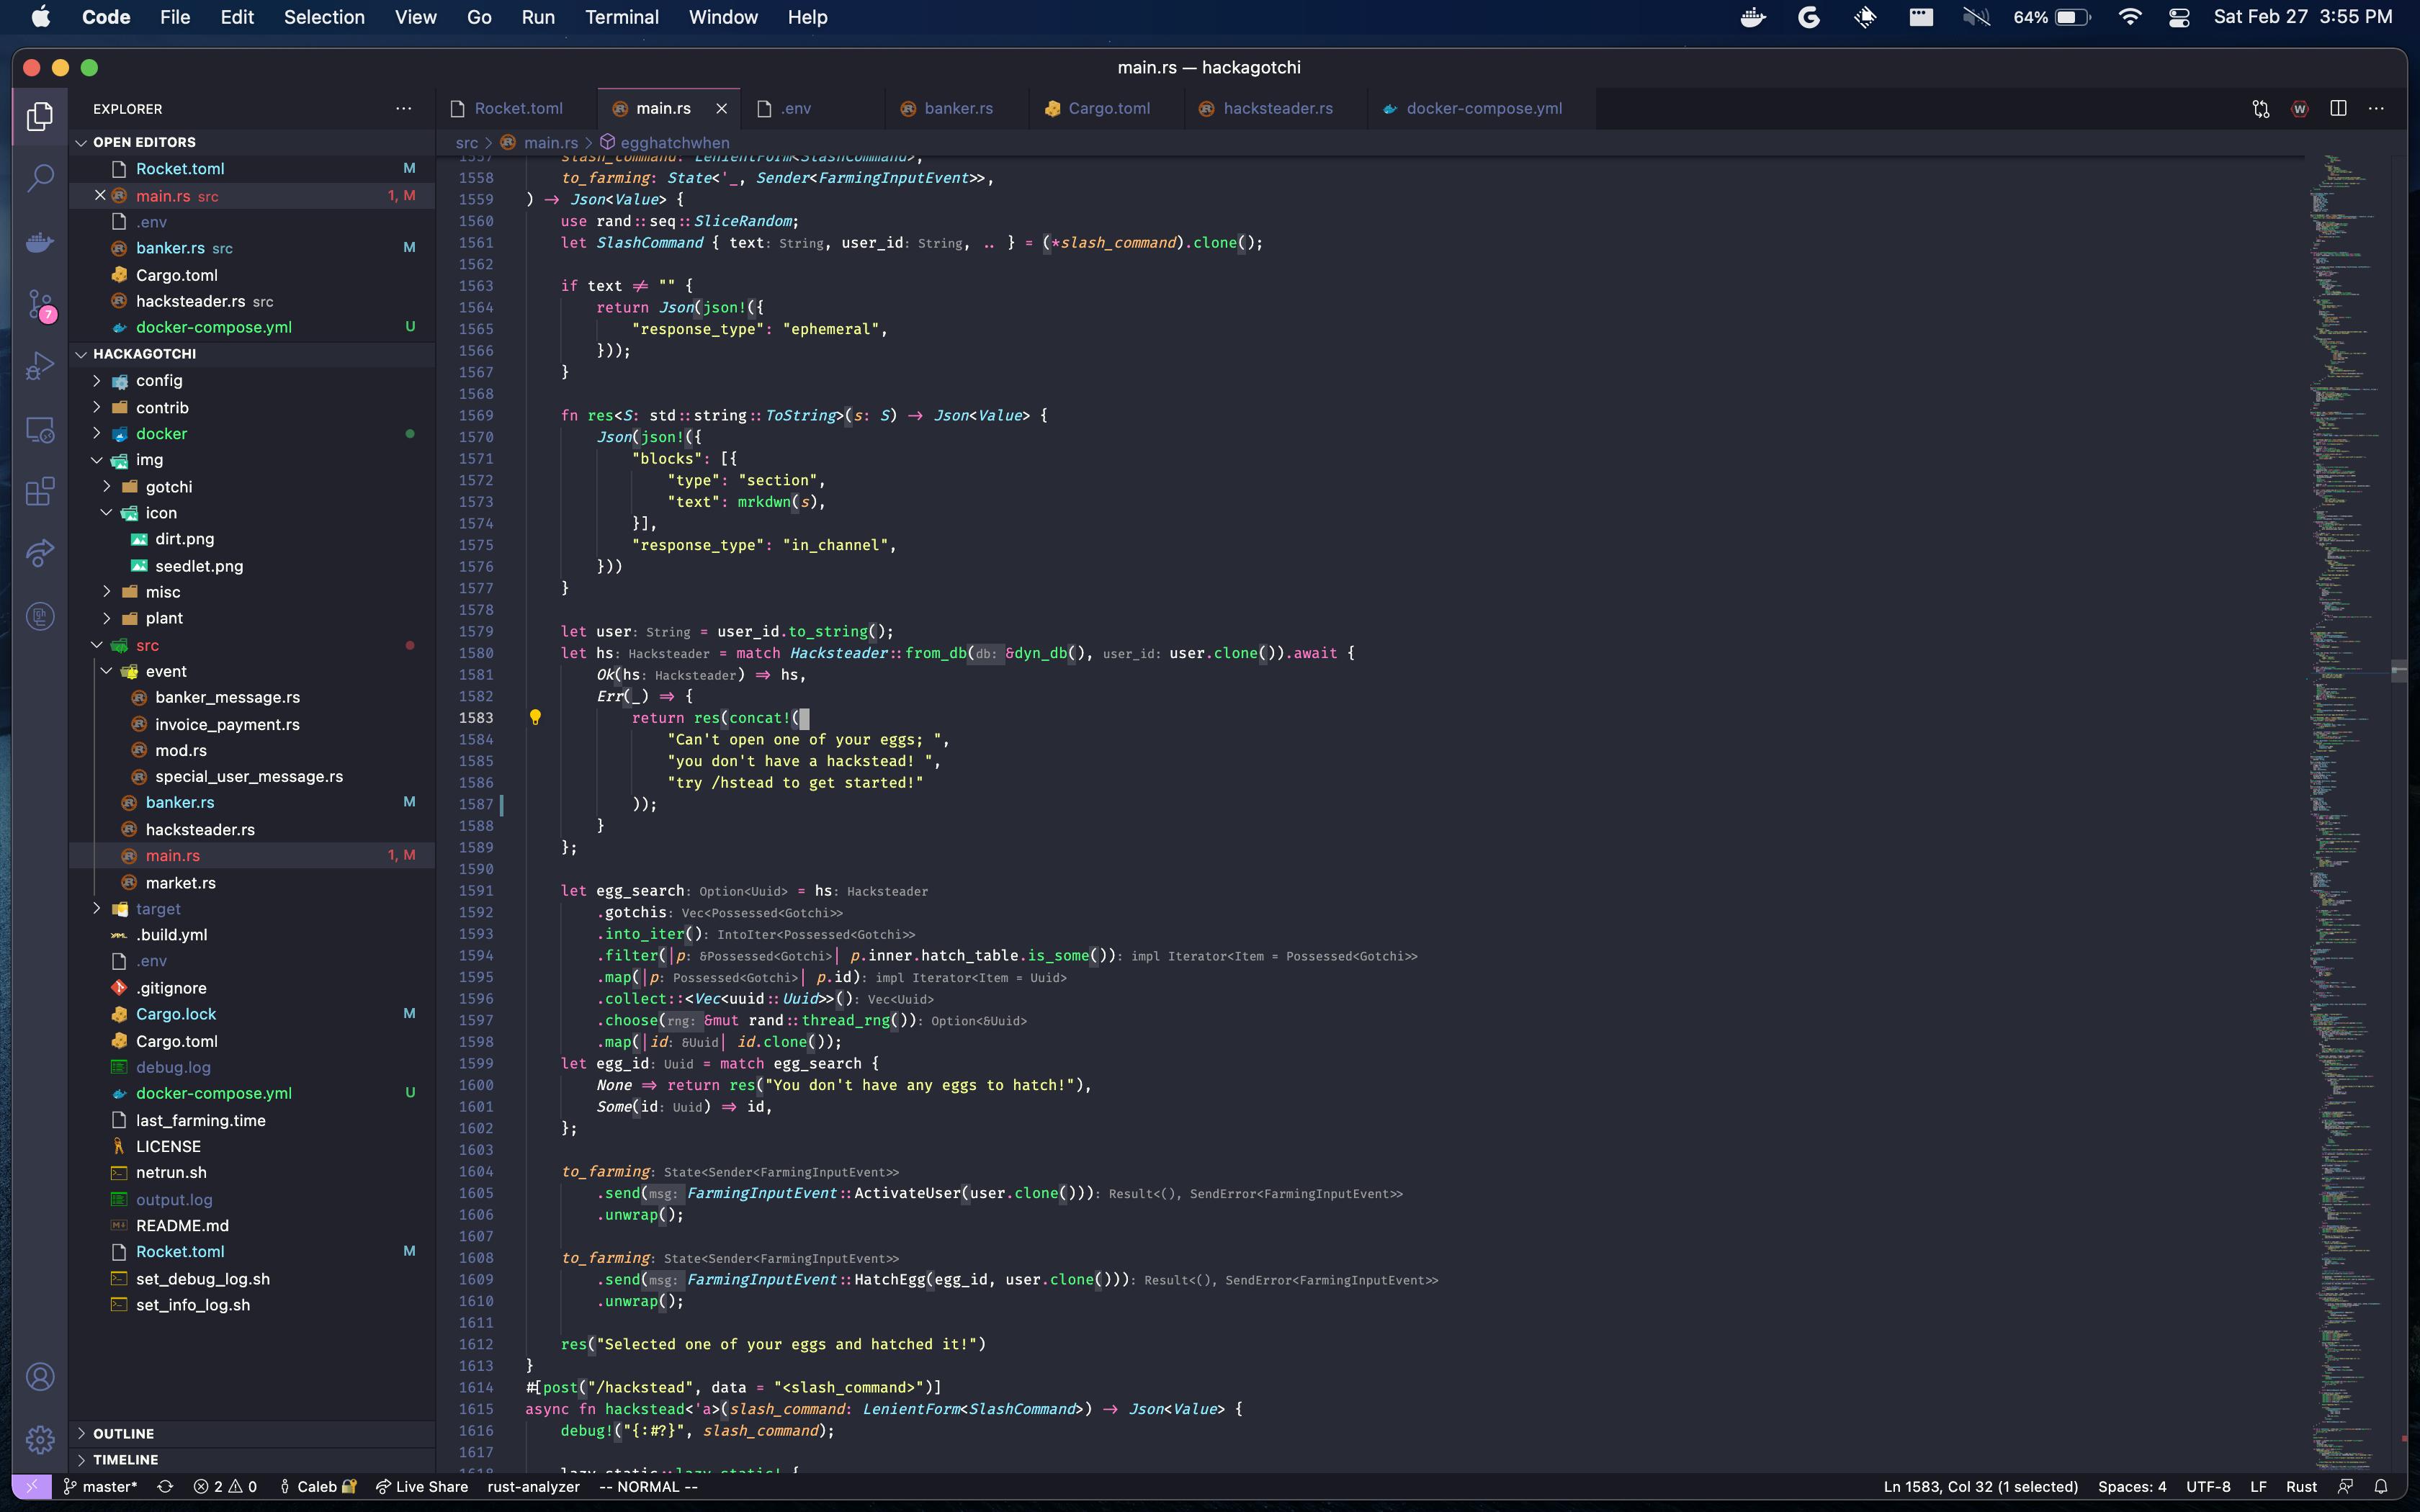 https://cloud-ku5a2szd1-hack-club-bot.vercel.app/0screen_shot_2021-02-27_at_3.55.14_pm.png